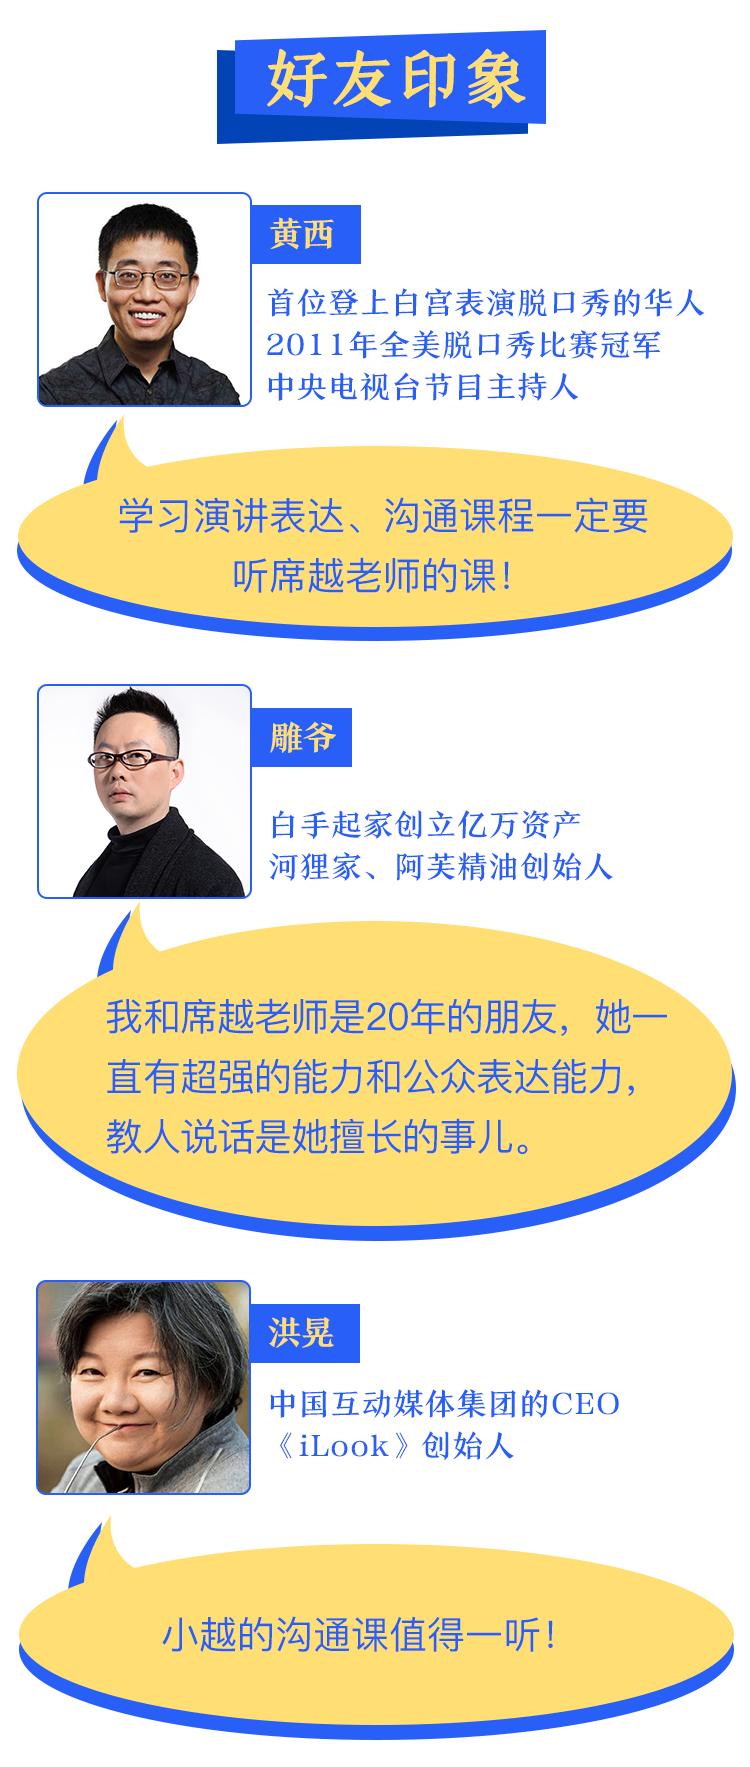 7月10日19沟通.png